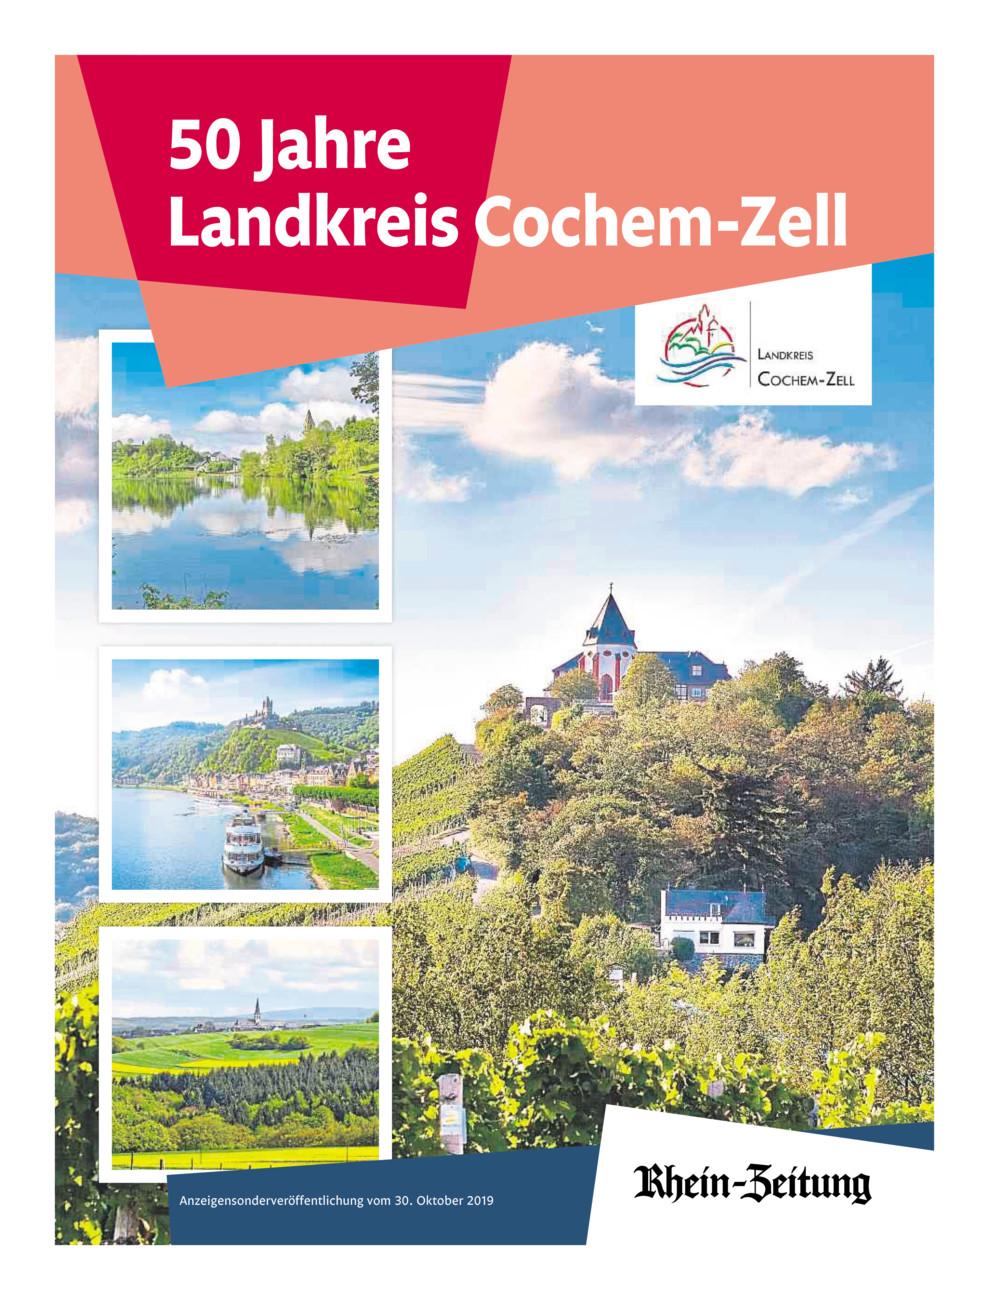 50 Jahre Cochem-Zell